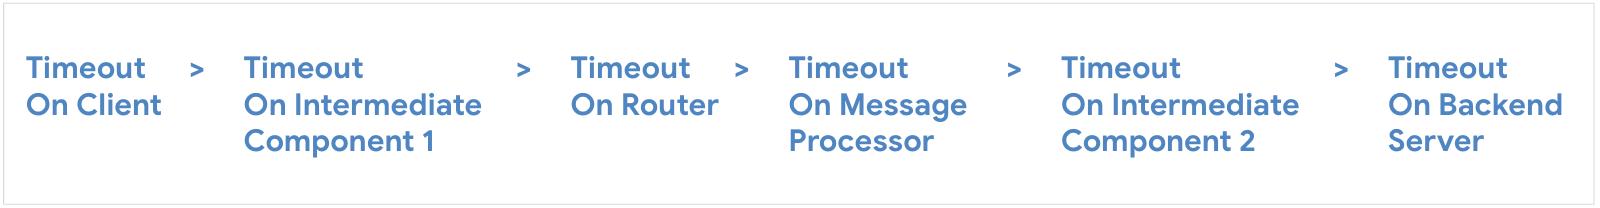 Configure timeout on client, then Intermediate Component 1, then Router, then Message Processor, then Intermediate Component 2, then Backend Server